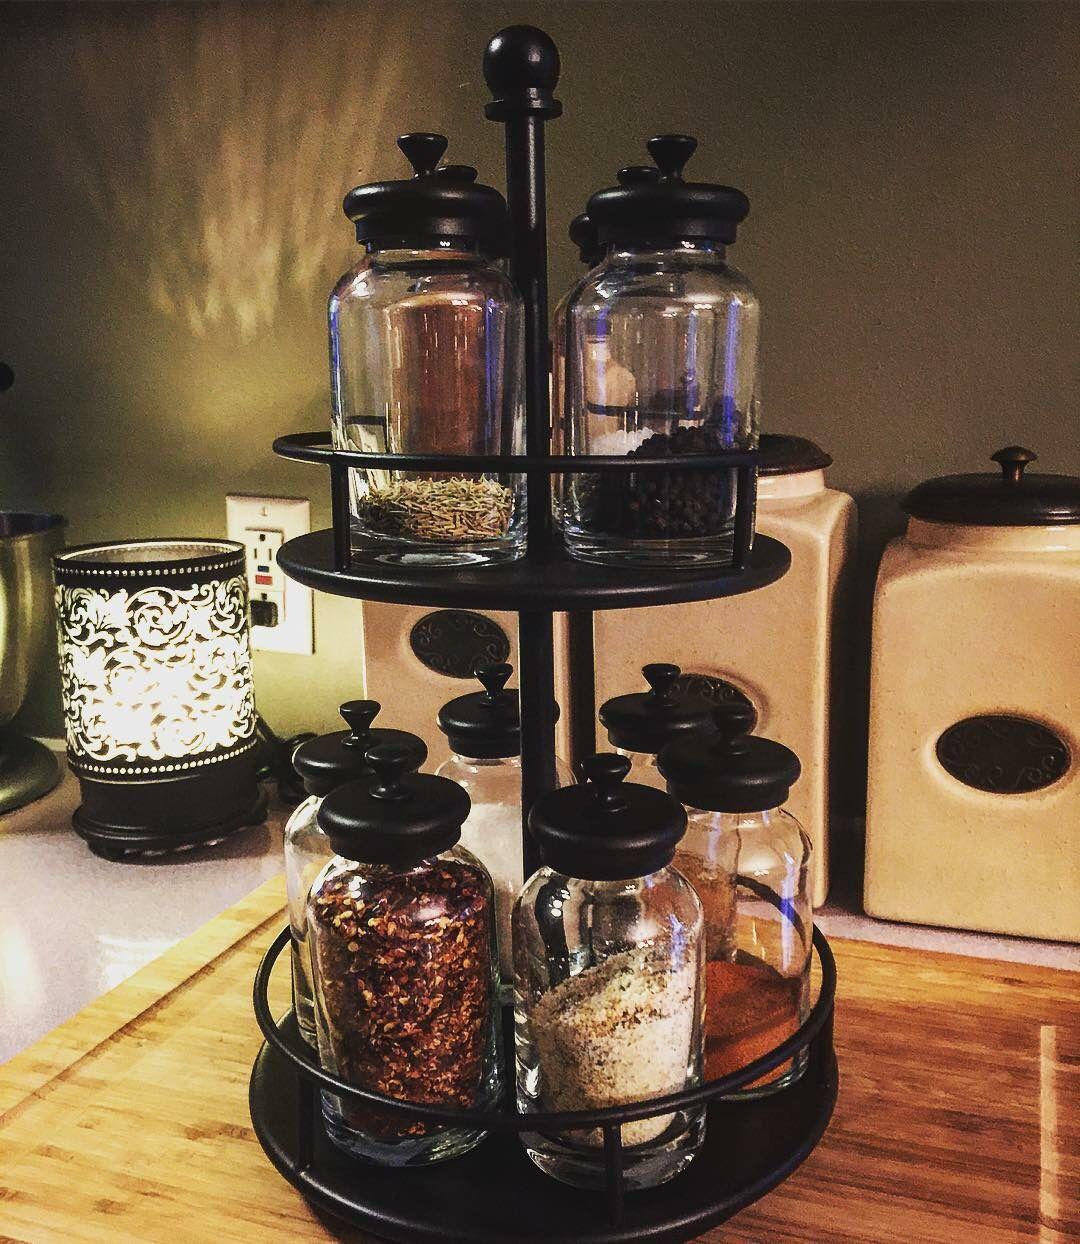 Pottery Barn Spice Racks